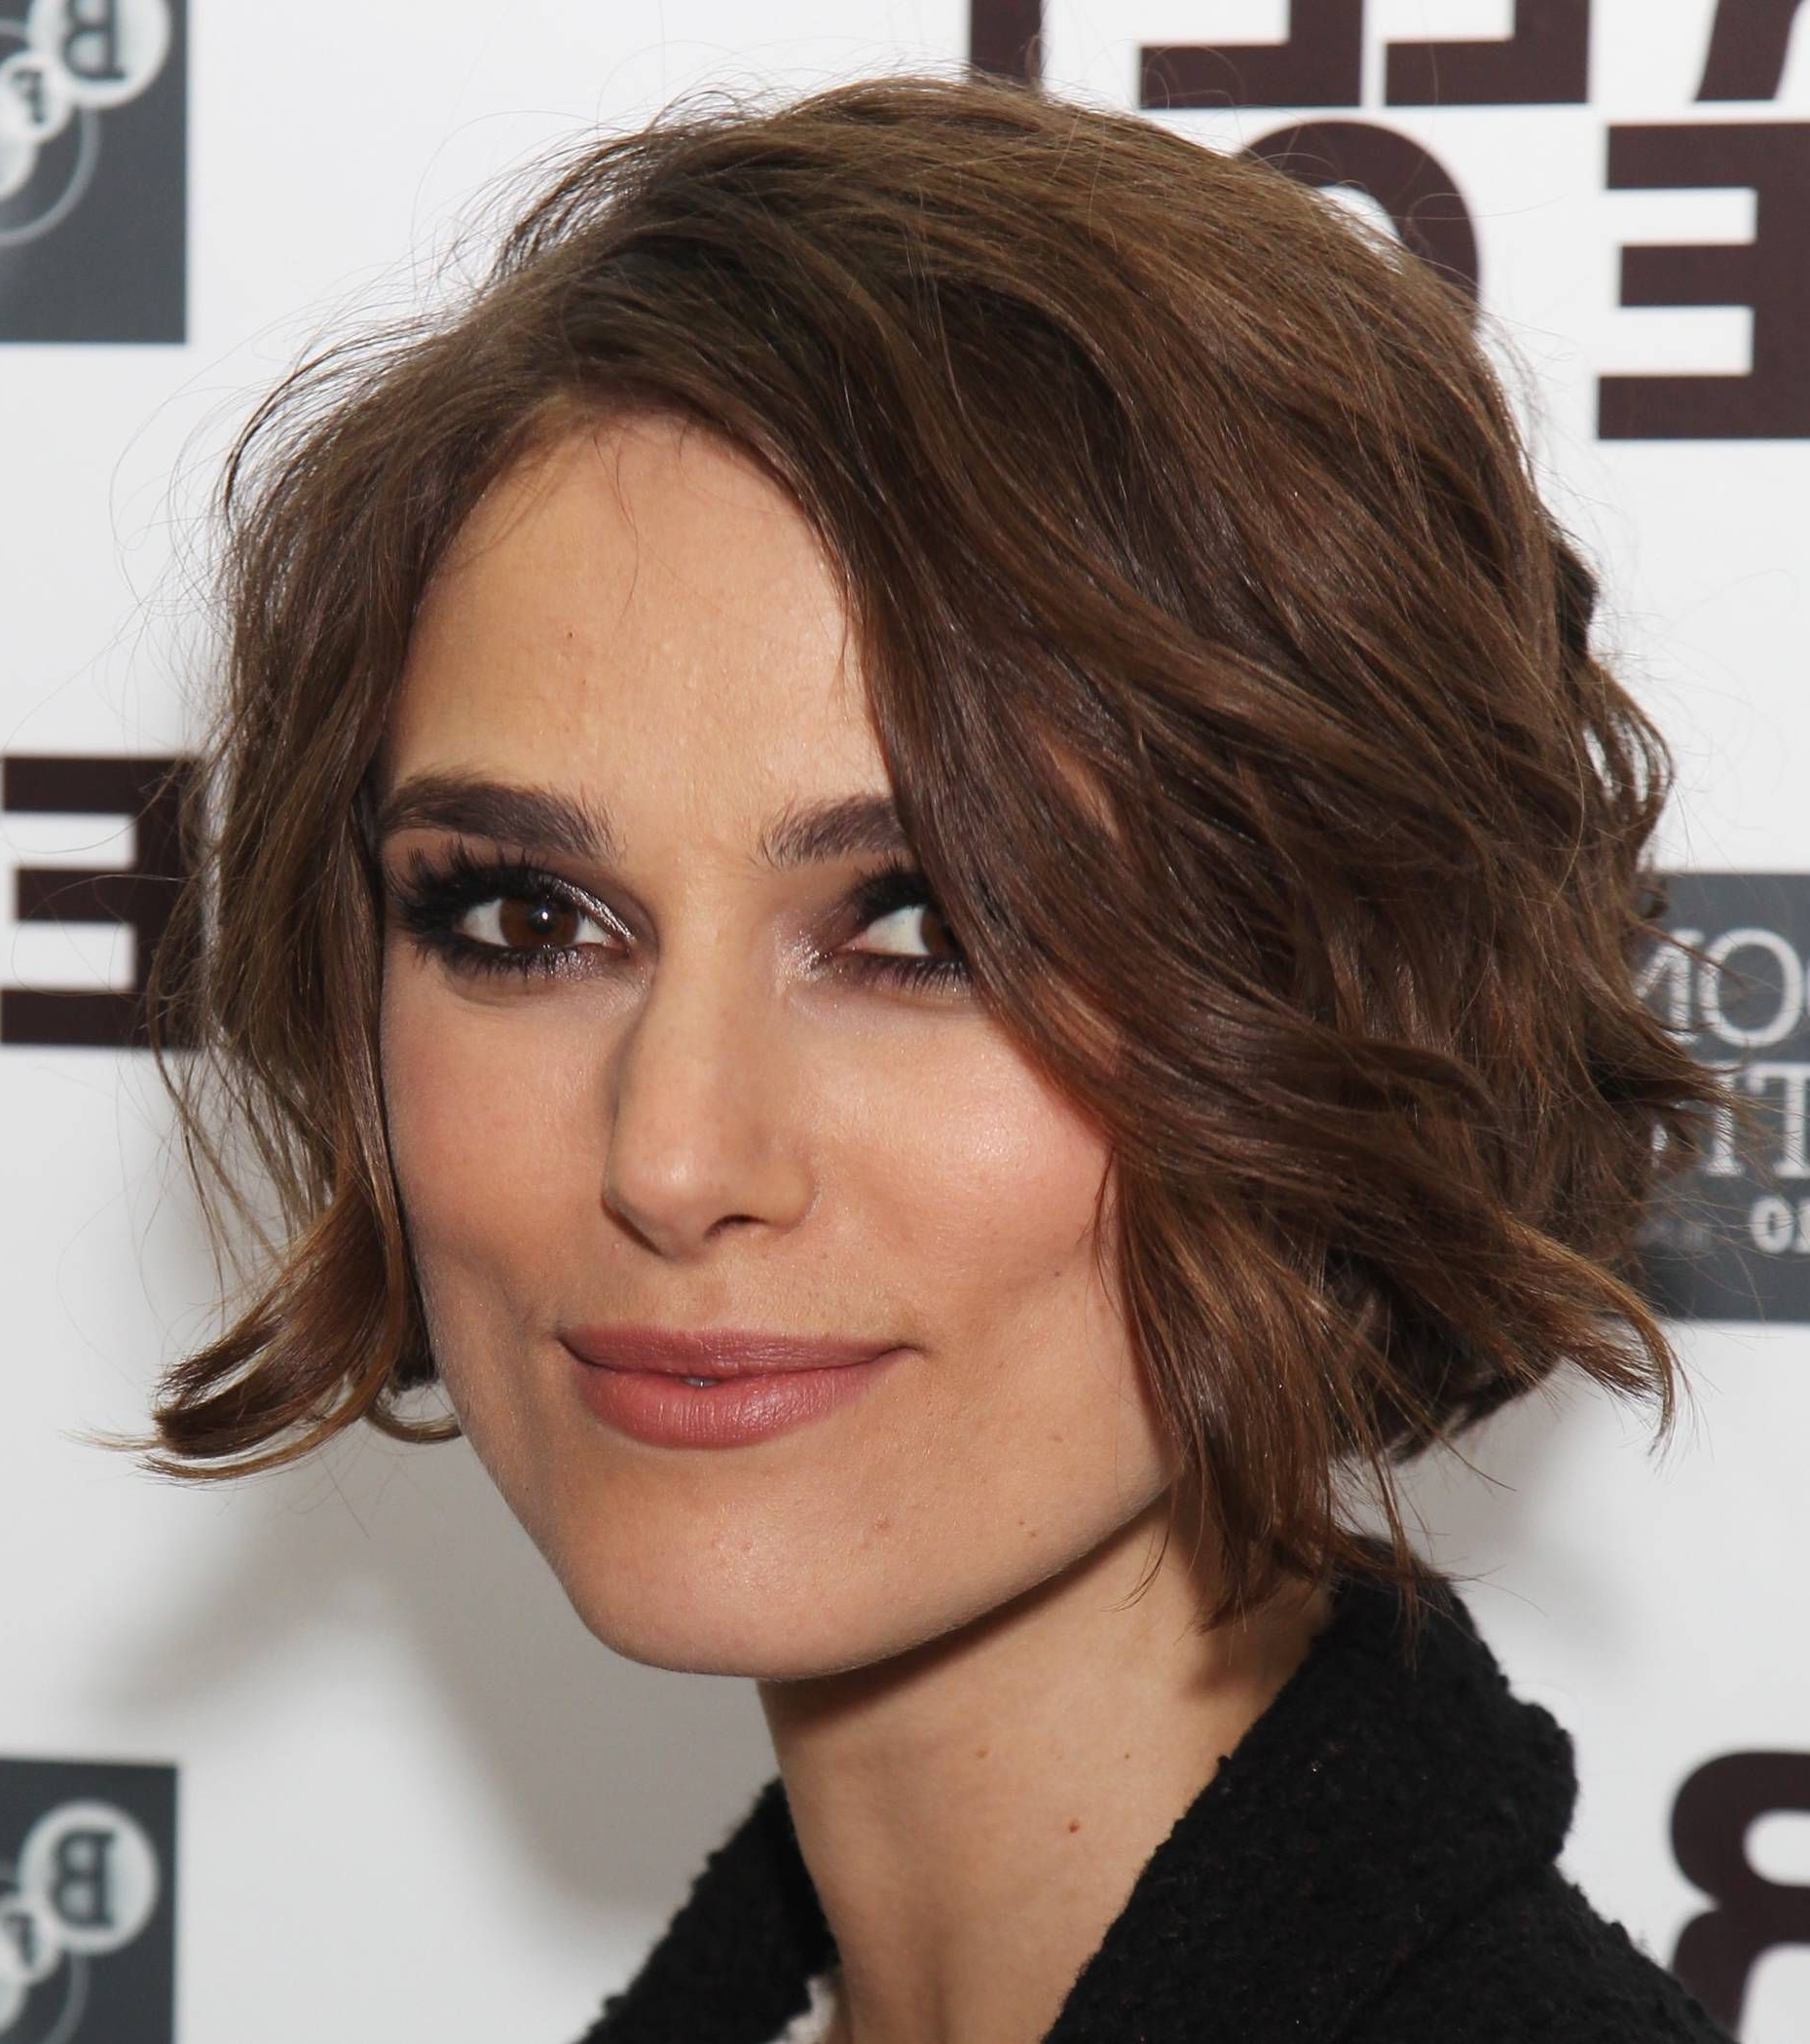 New Beauty Short Hairstyles Short Wavy Hairstyles Low Maintenance Regarding Low Maintenance Short Hairstyles (View 12 of 25)